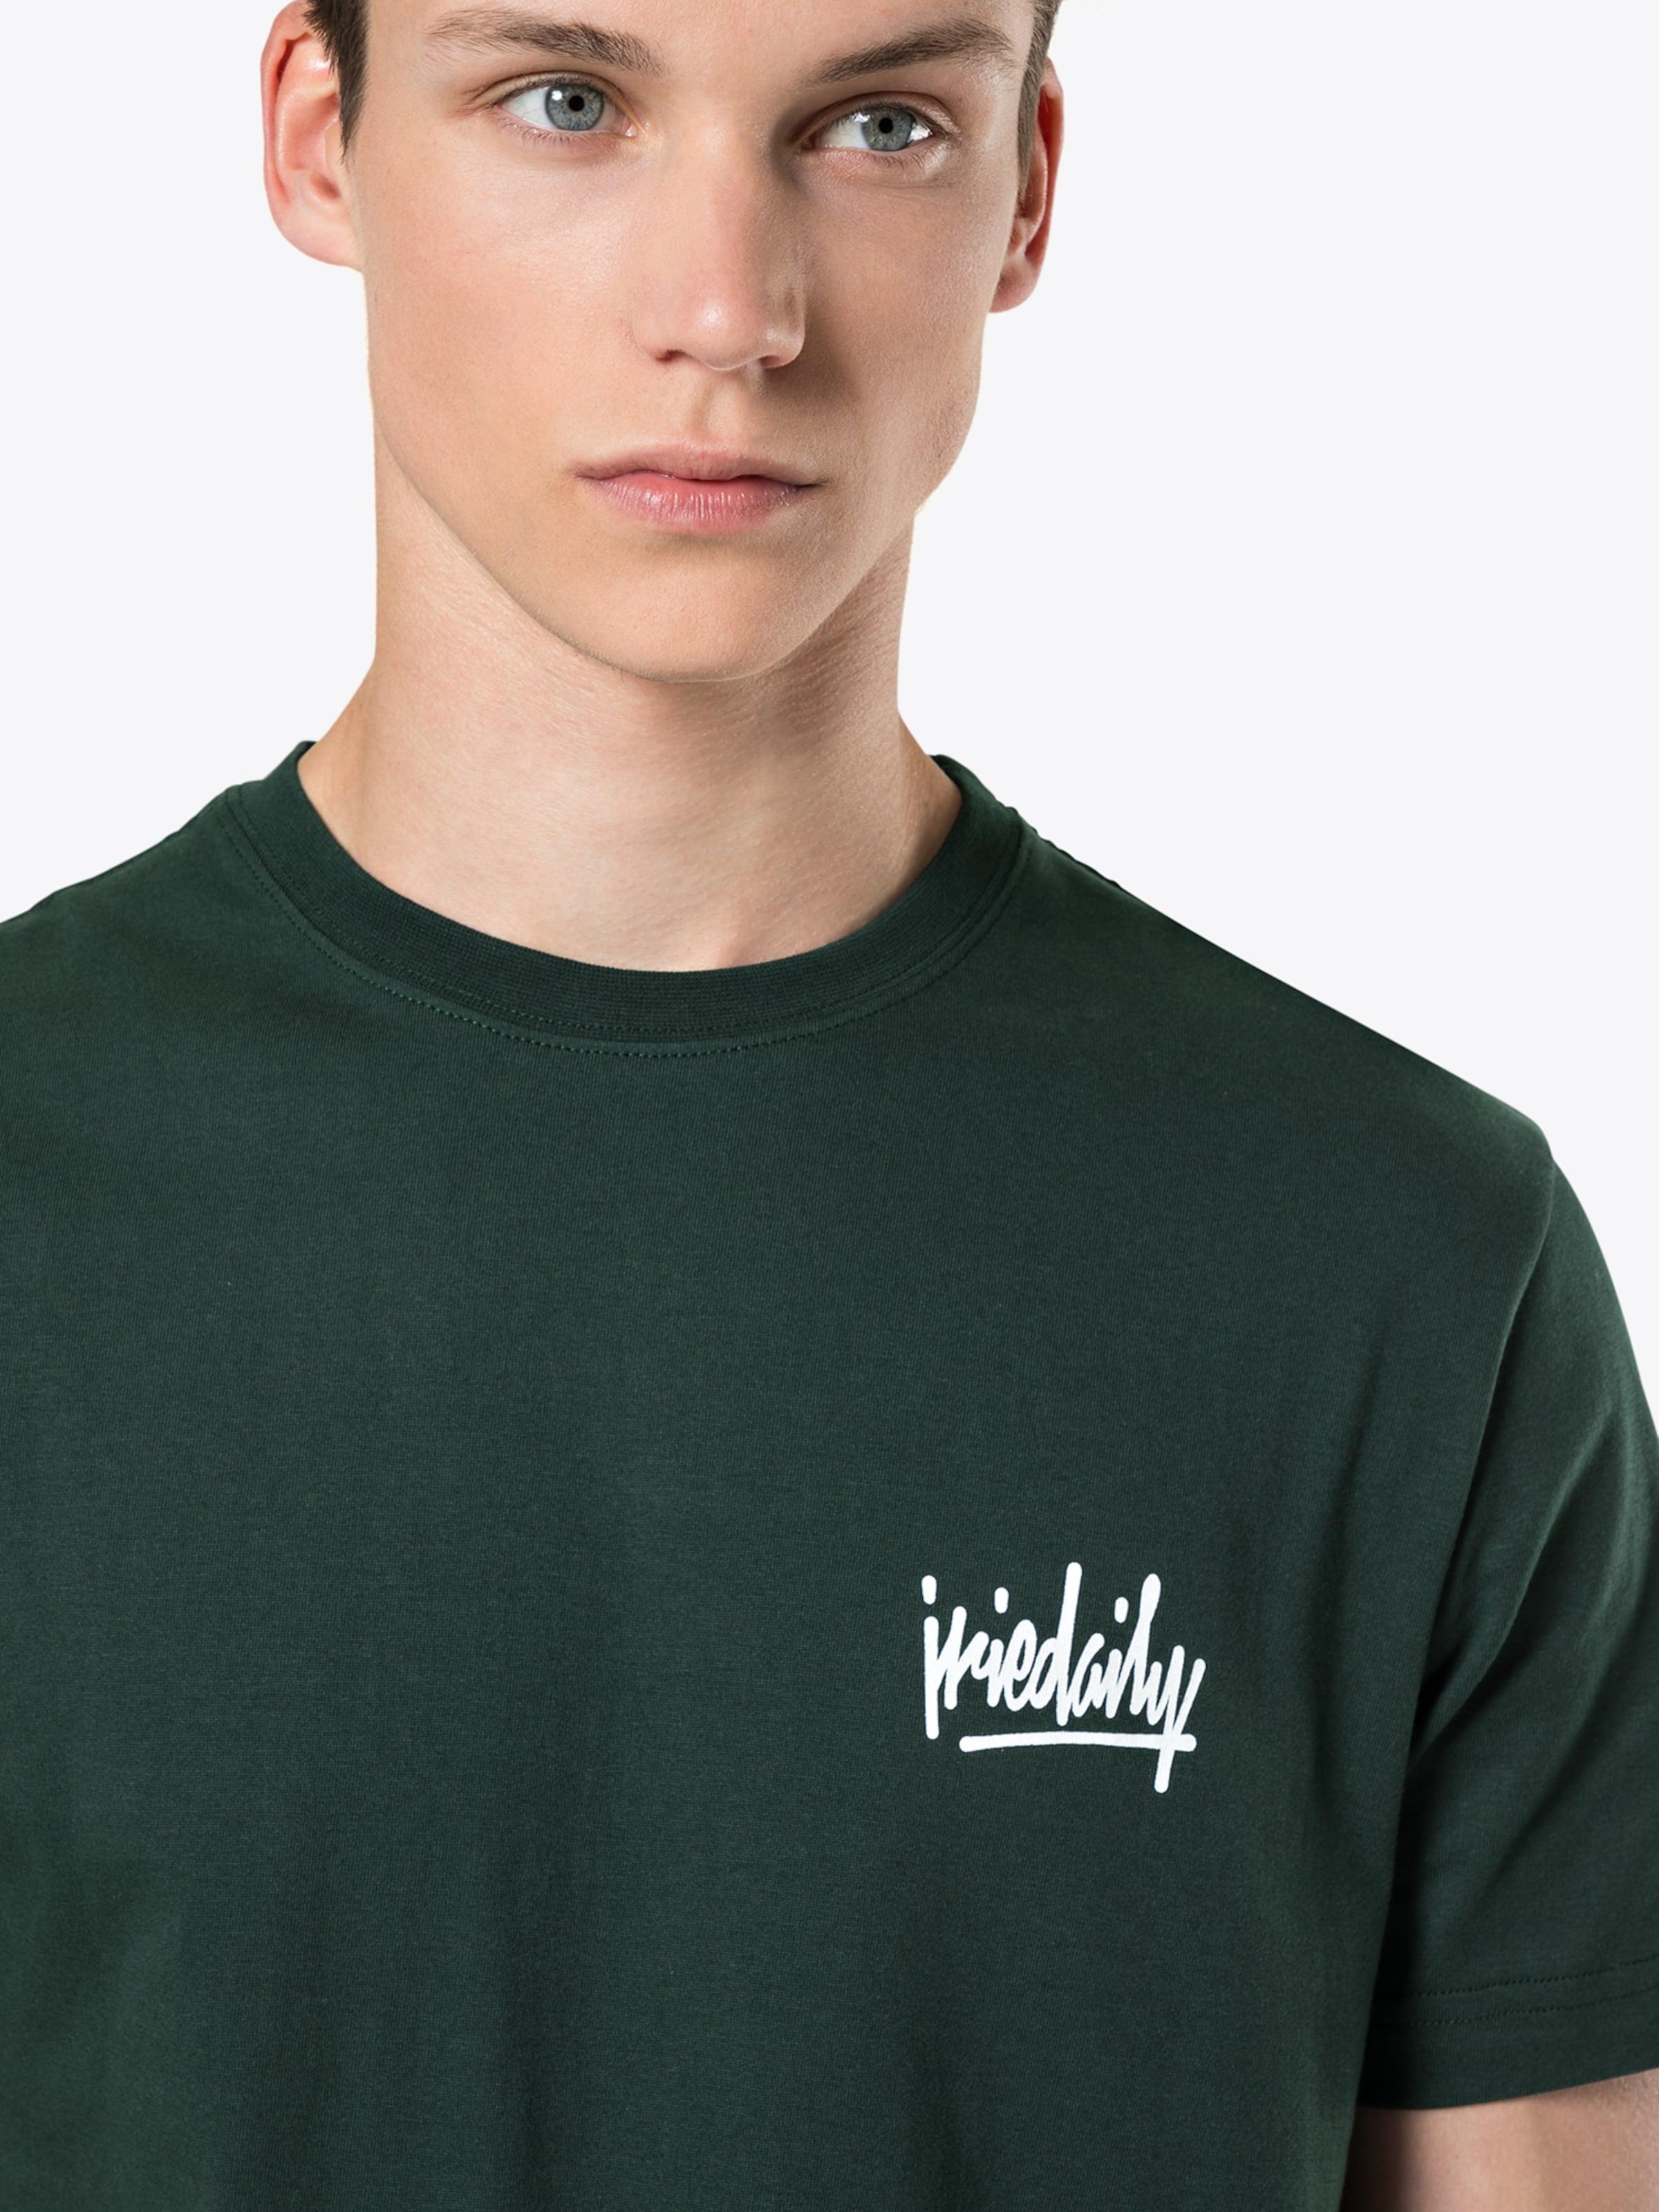 Noir T shirt Iriedaily Tee' En 'tagg XiuPkZ